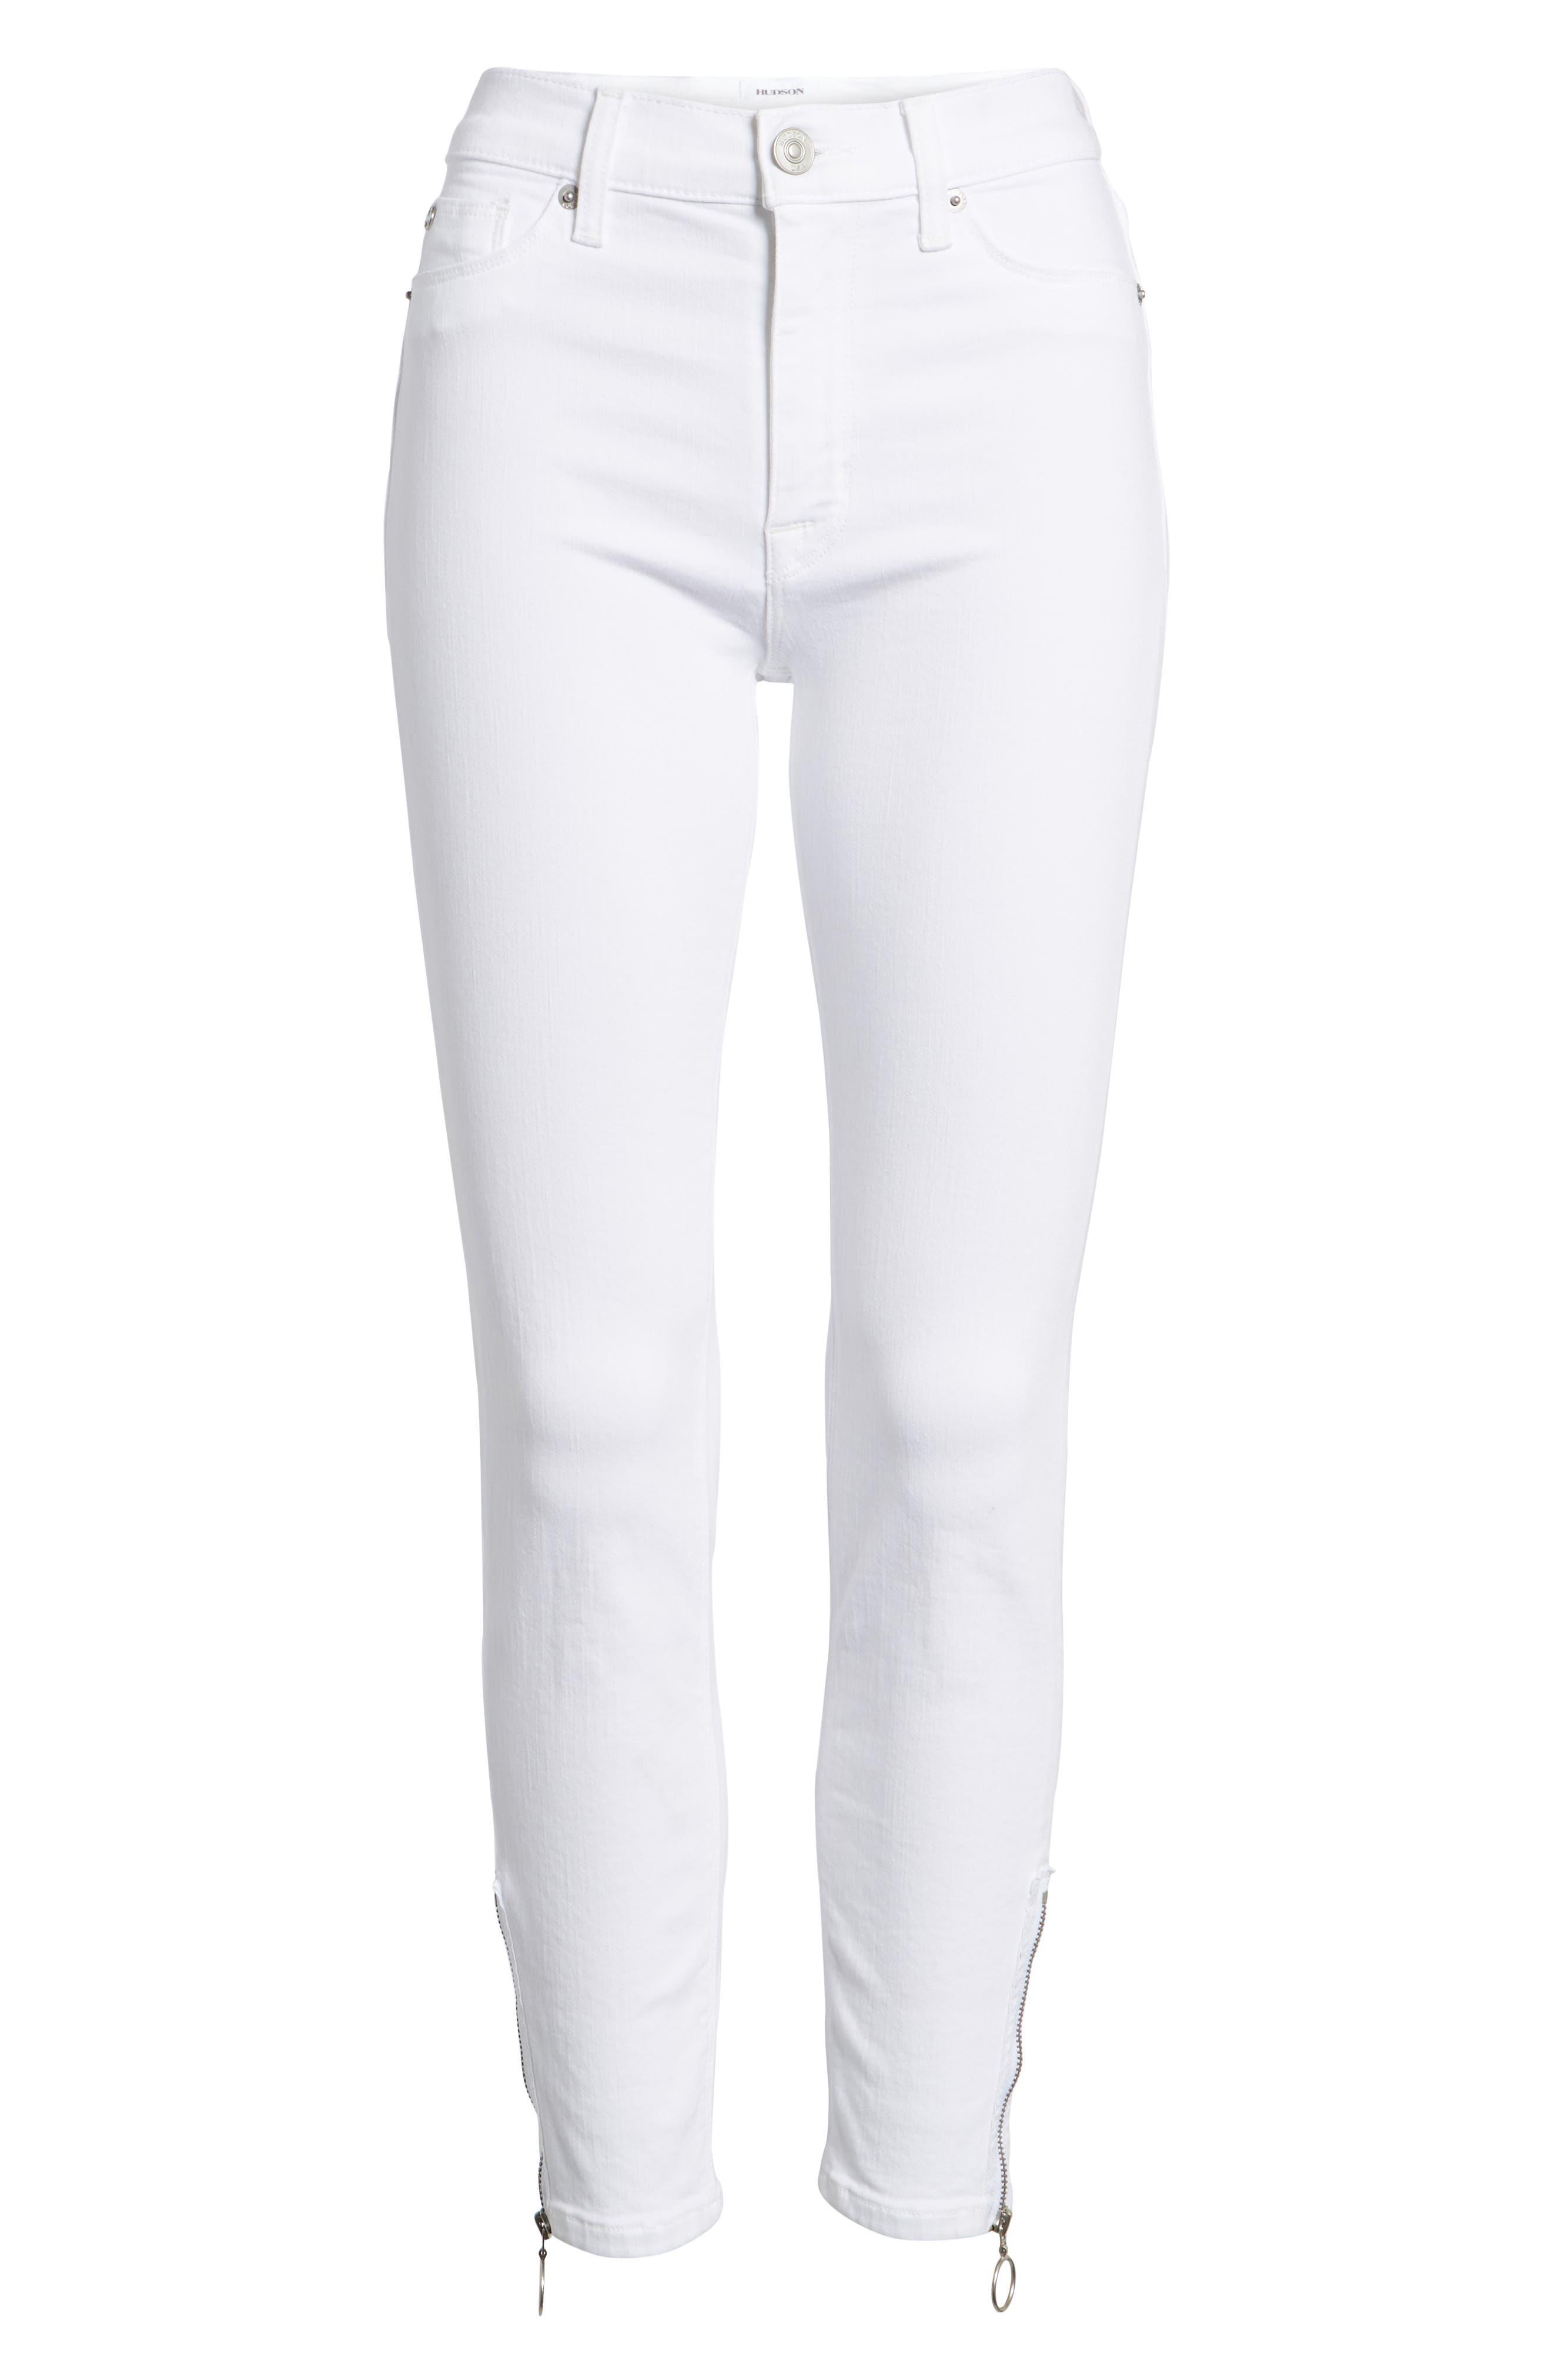 Barbara High Waist Ankle Skinny Jeans,                             Alternate thumbnail 6, color,                             110